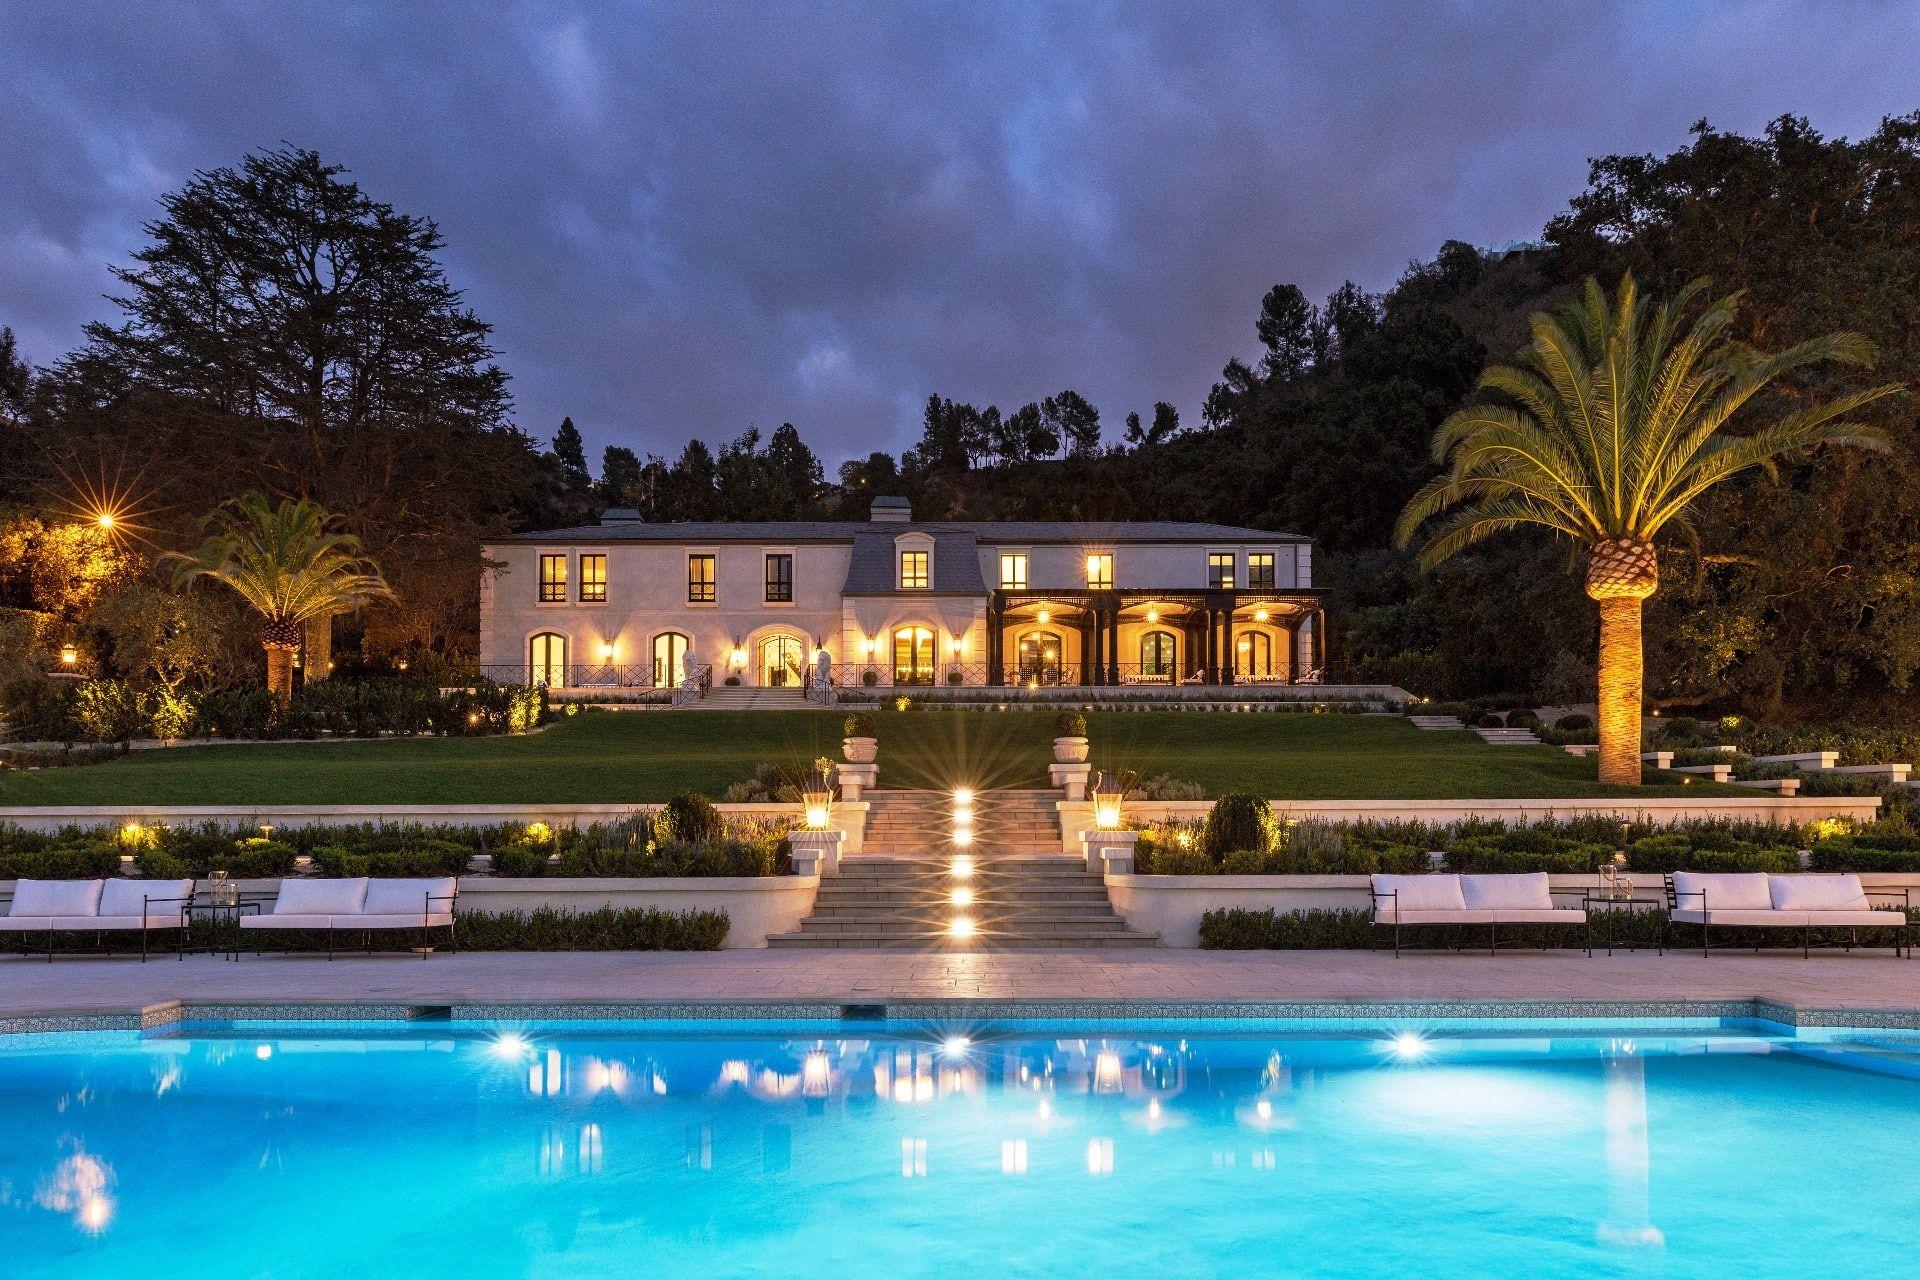 Hilton & Hyland Beverly Hills Real Estate Hilton